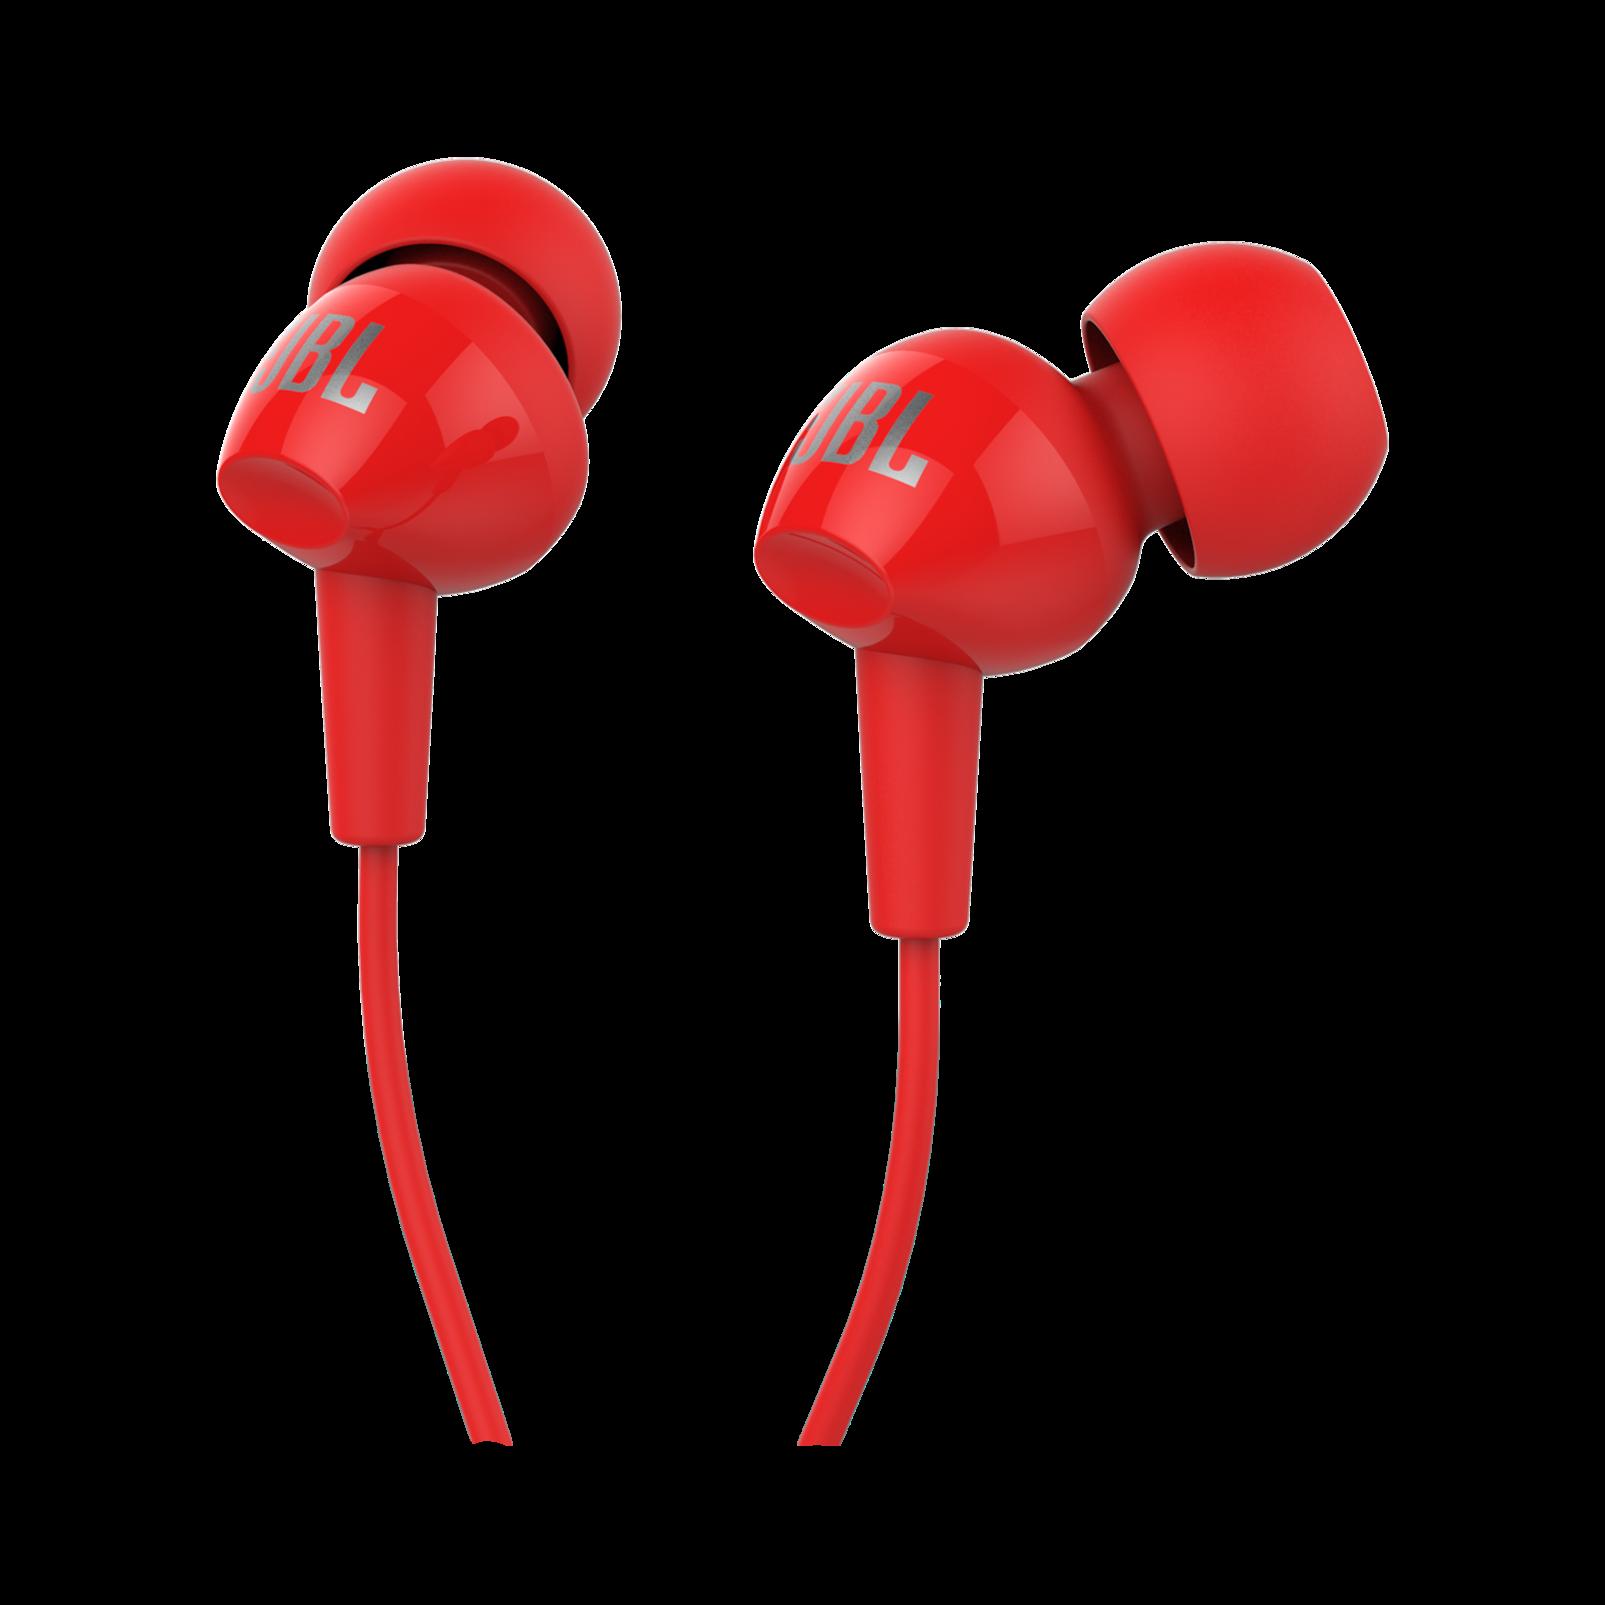 C100SI - Red - In-Ear Headphones - Detailshot 2